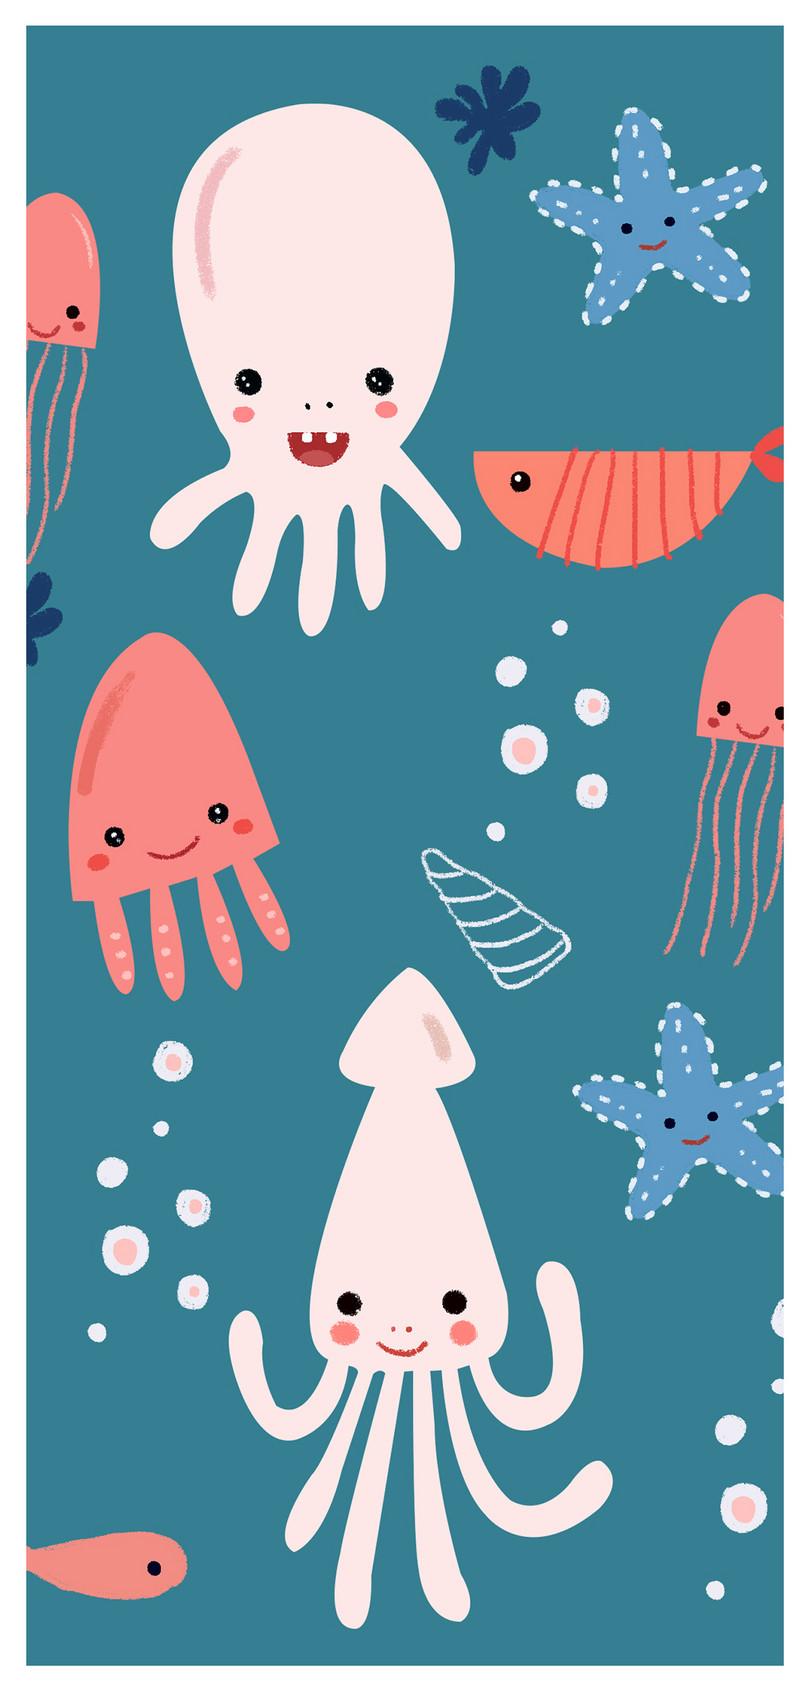 Wallpaper Bergerak Kartun Kehidupan Laut Gambar Unduh